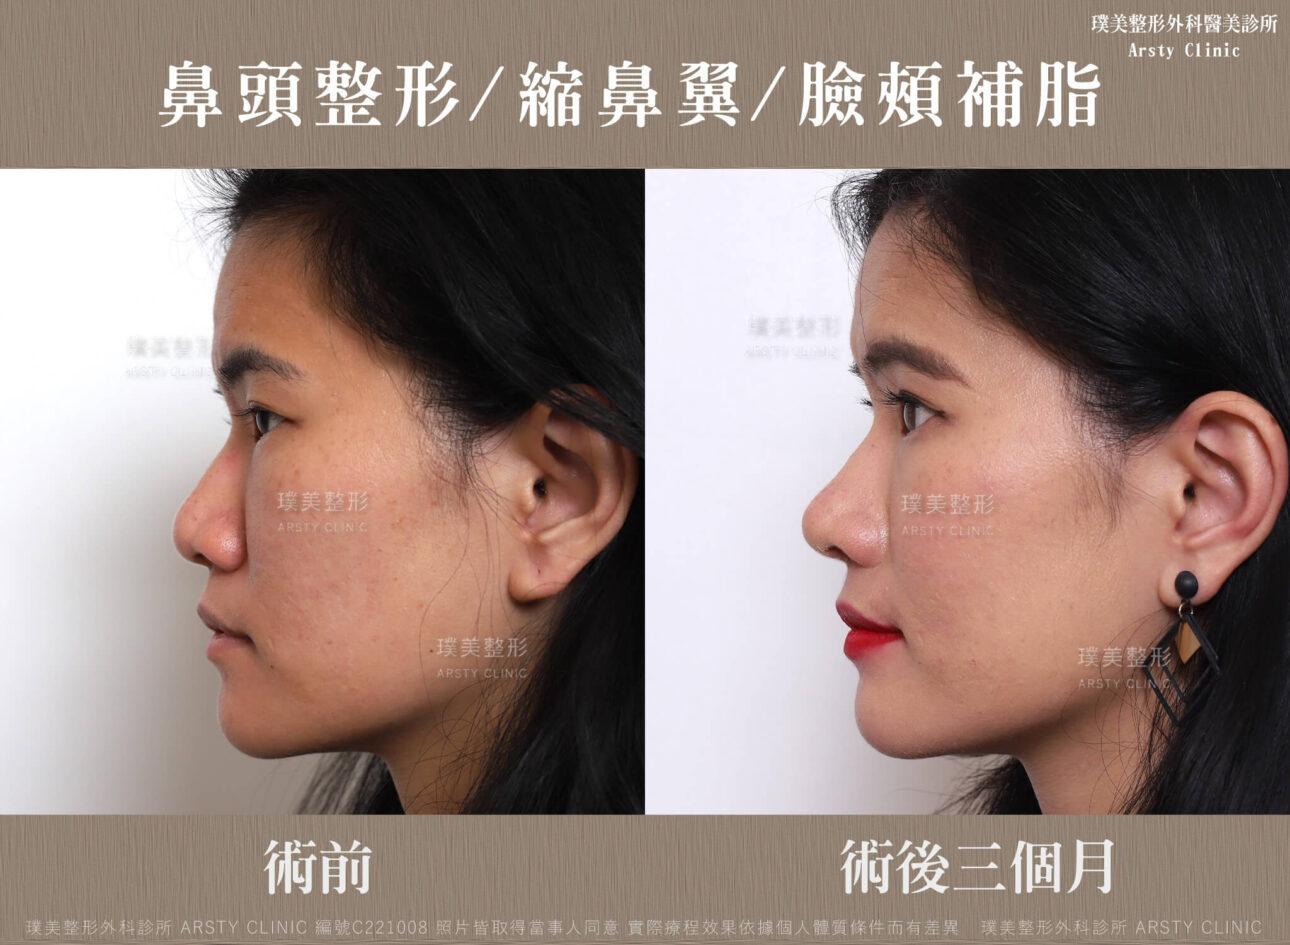 鼻頭整形 縮鼻翼 臉頰補脂 C221008BA3M07